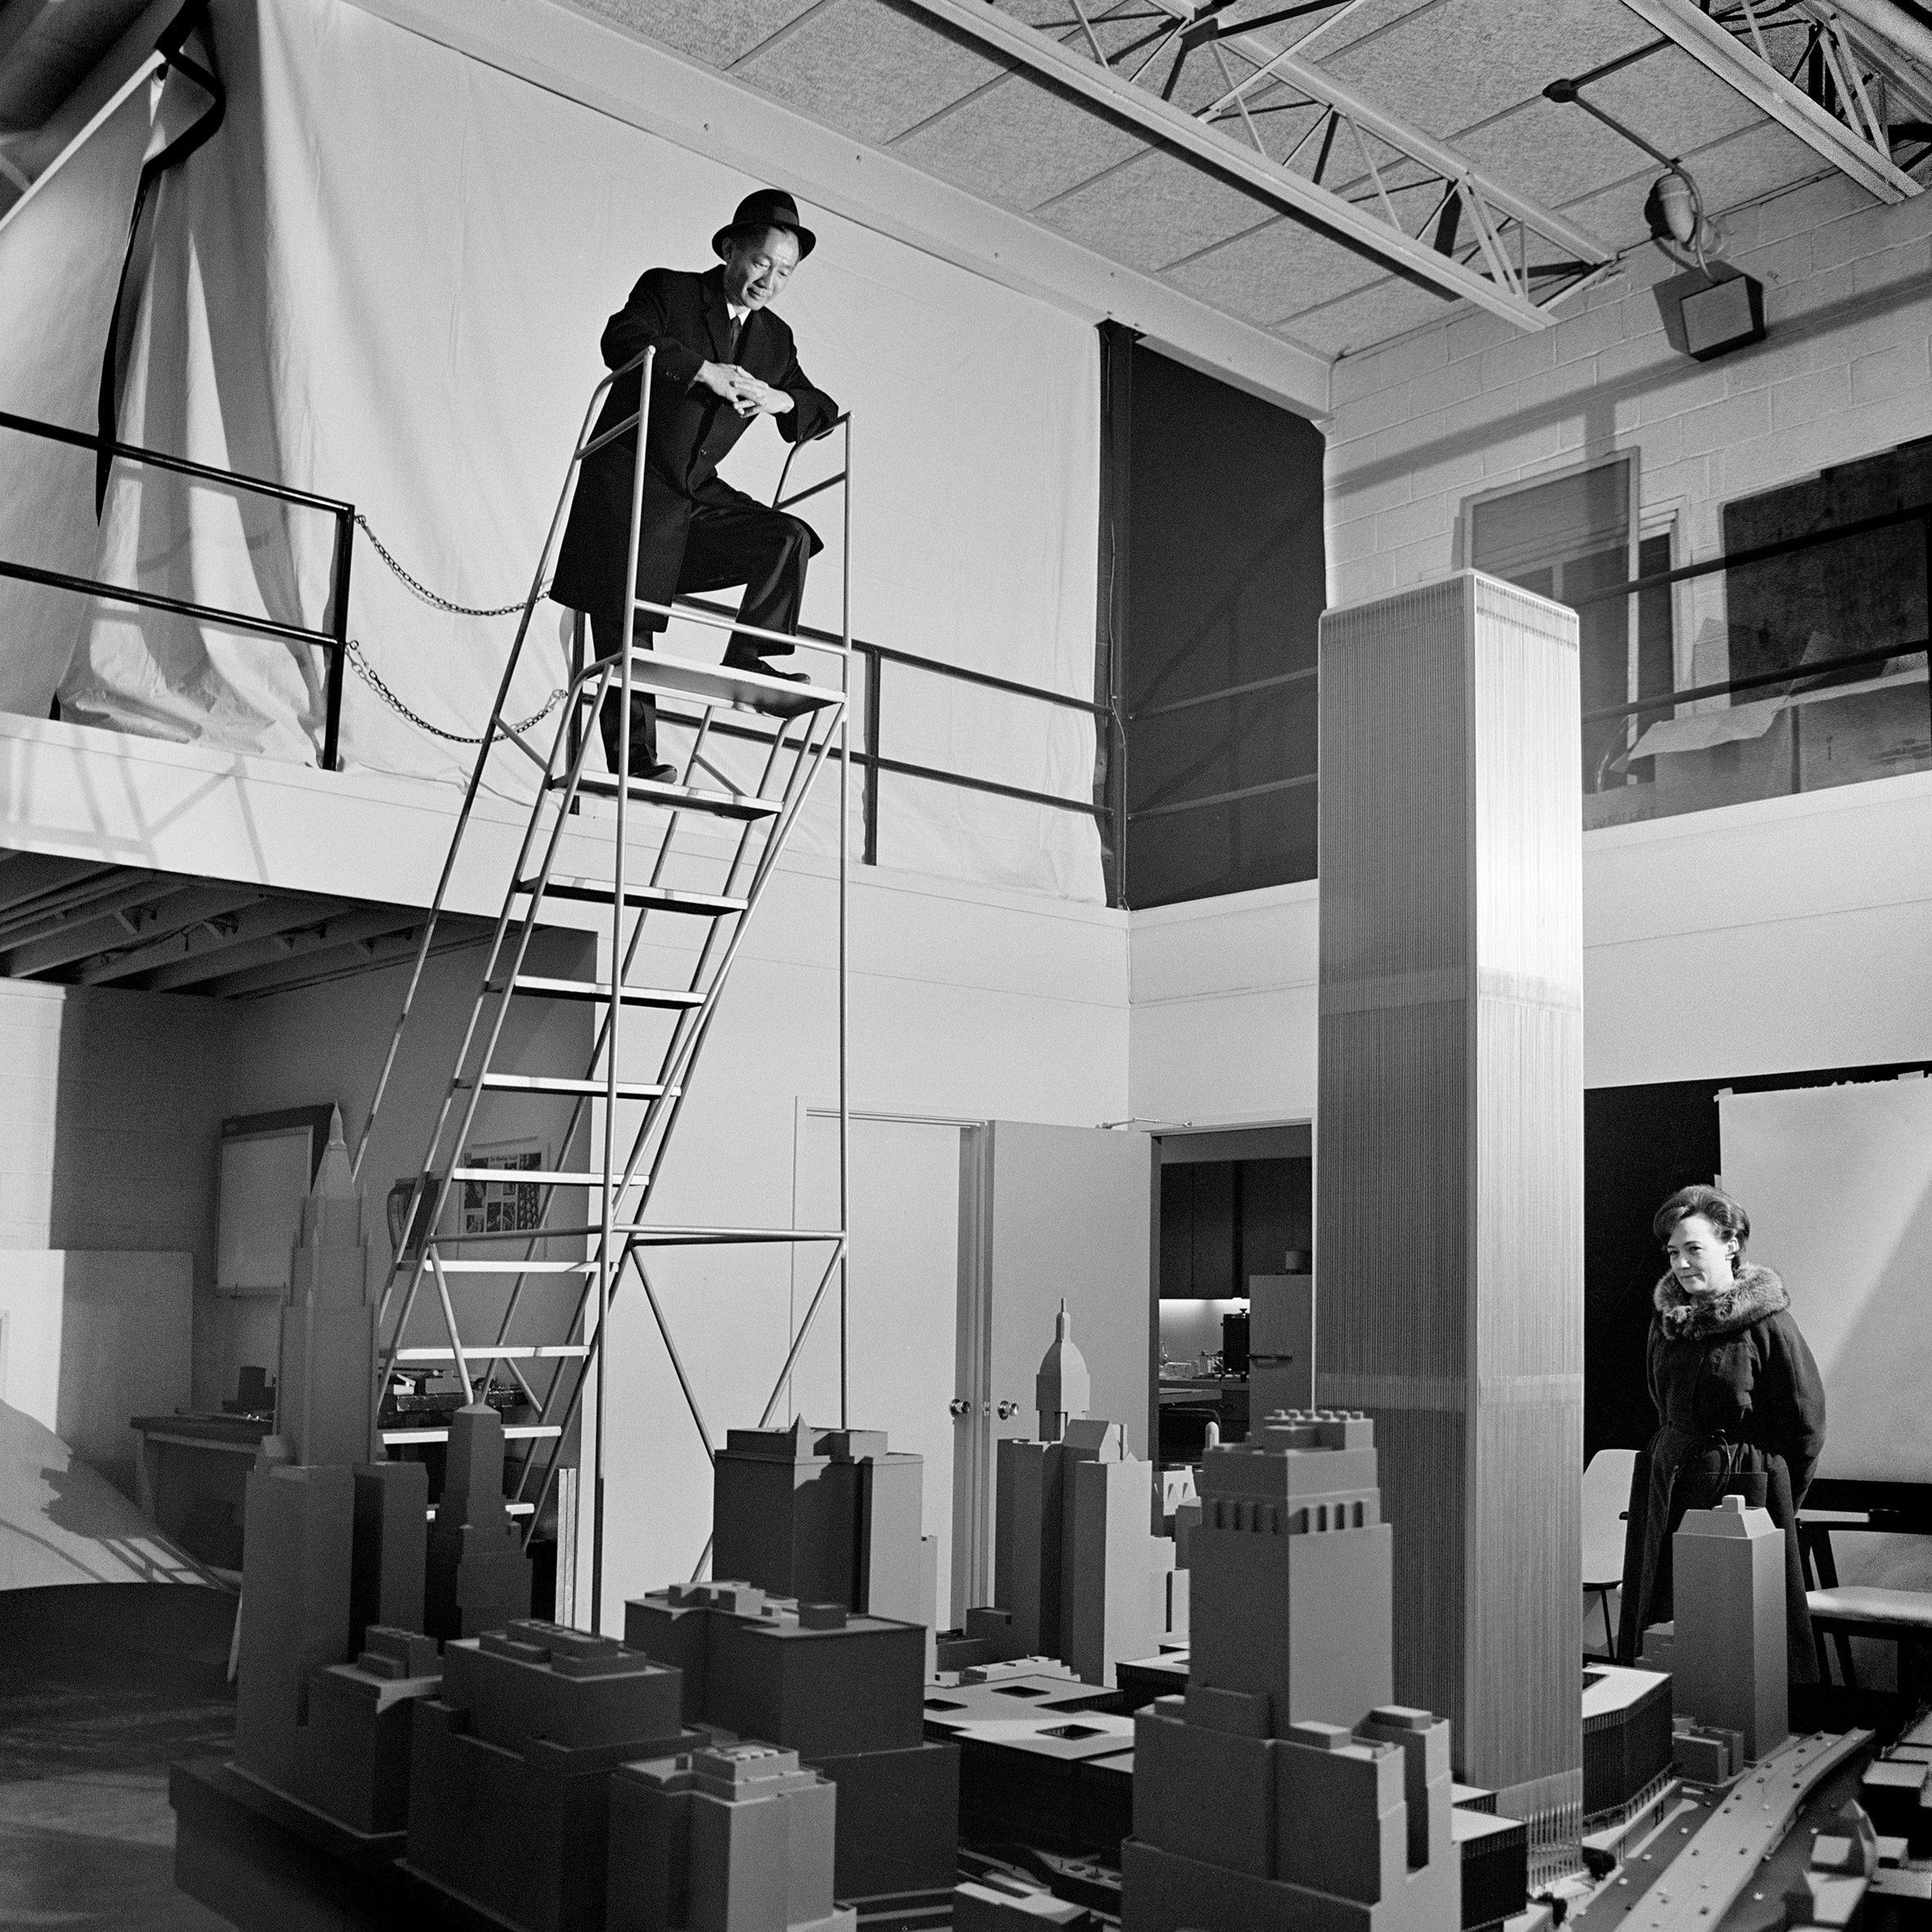 Minoru Yamasaki overlooking his model of World Trade Center